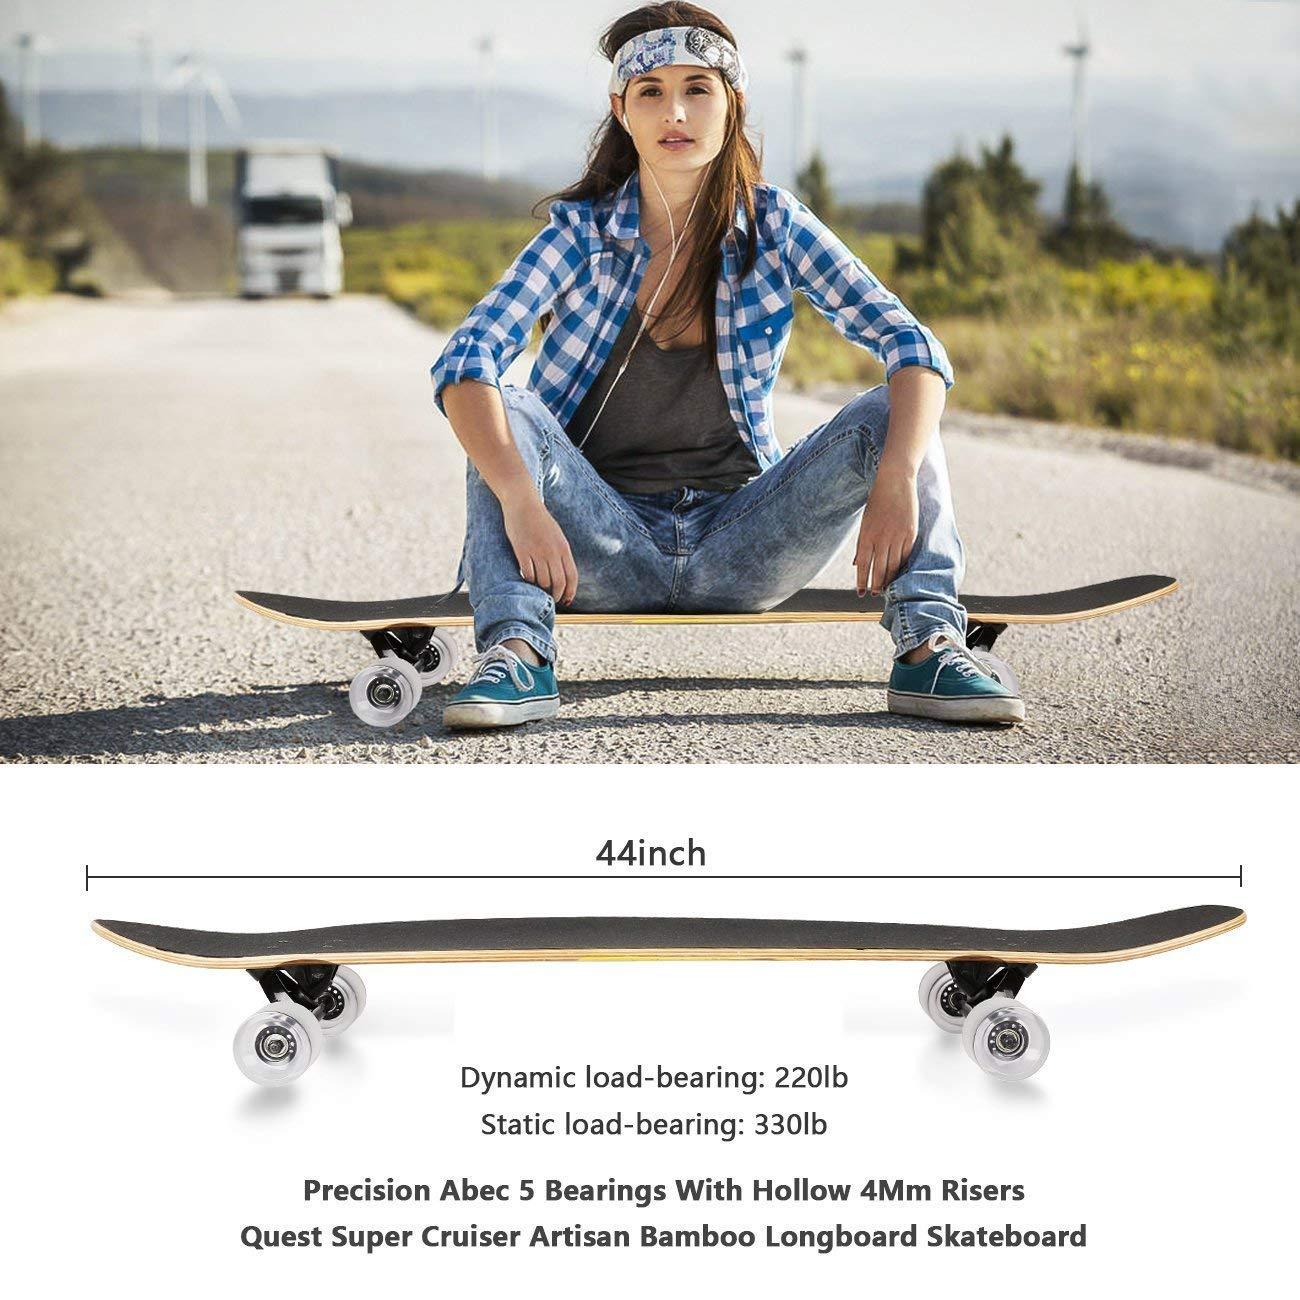 RockBirds Skateboard, 44 inch Complete Super Cruiser Longboard Skateboard, 7 Layer Canadian Maple Deck